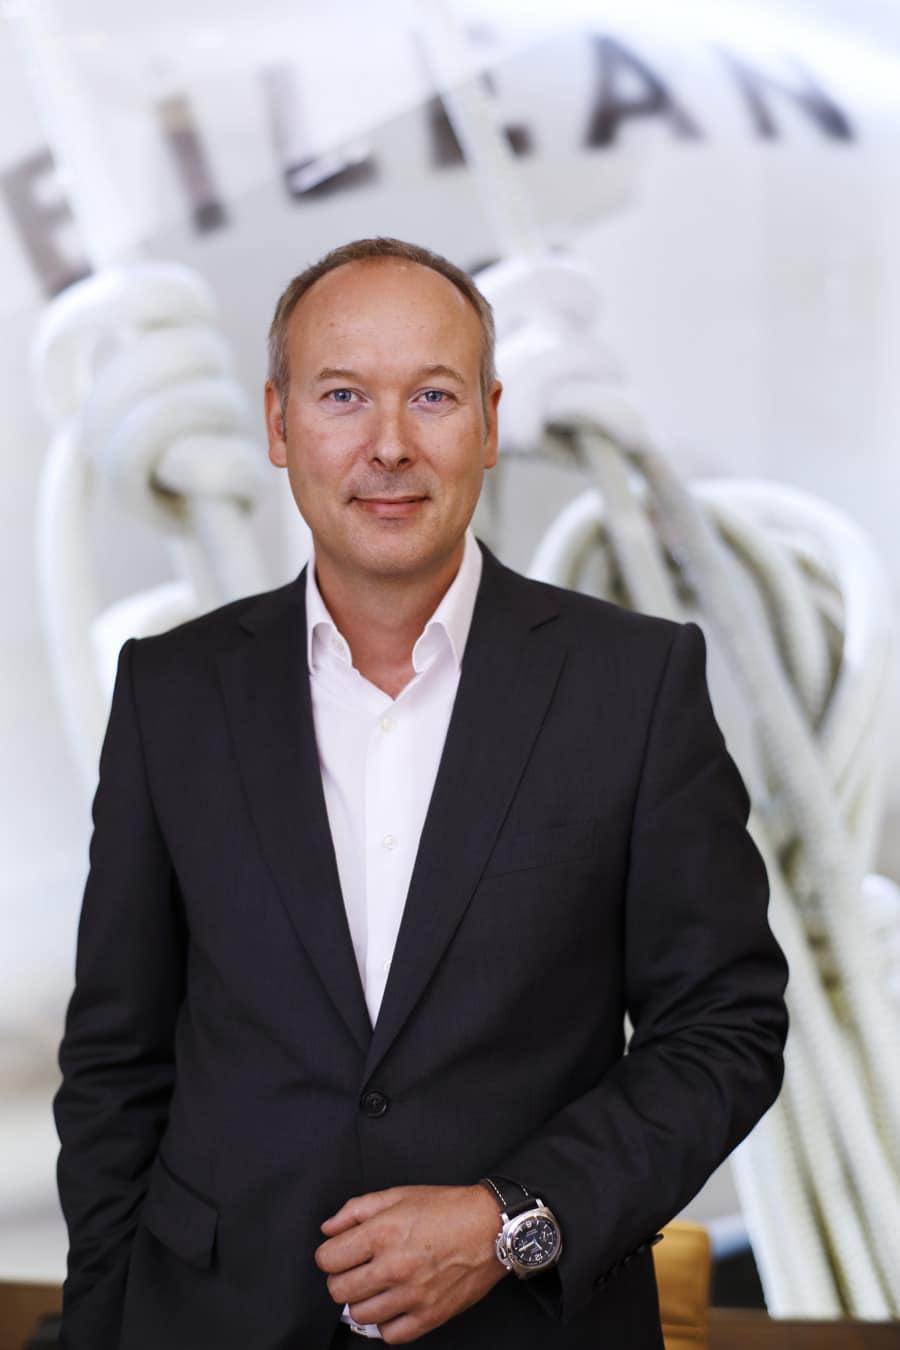 Panerai: Marcel Rössner, General Manager